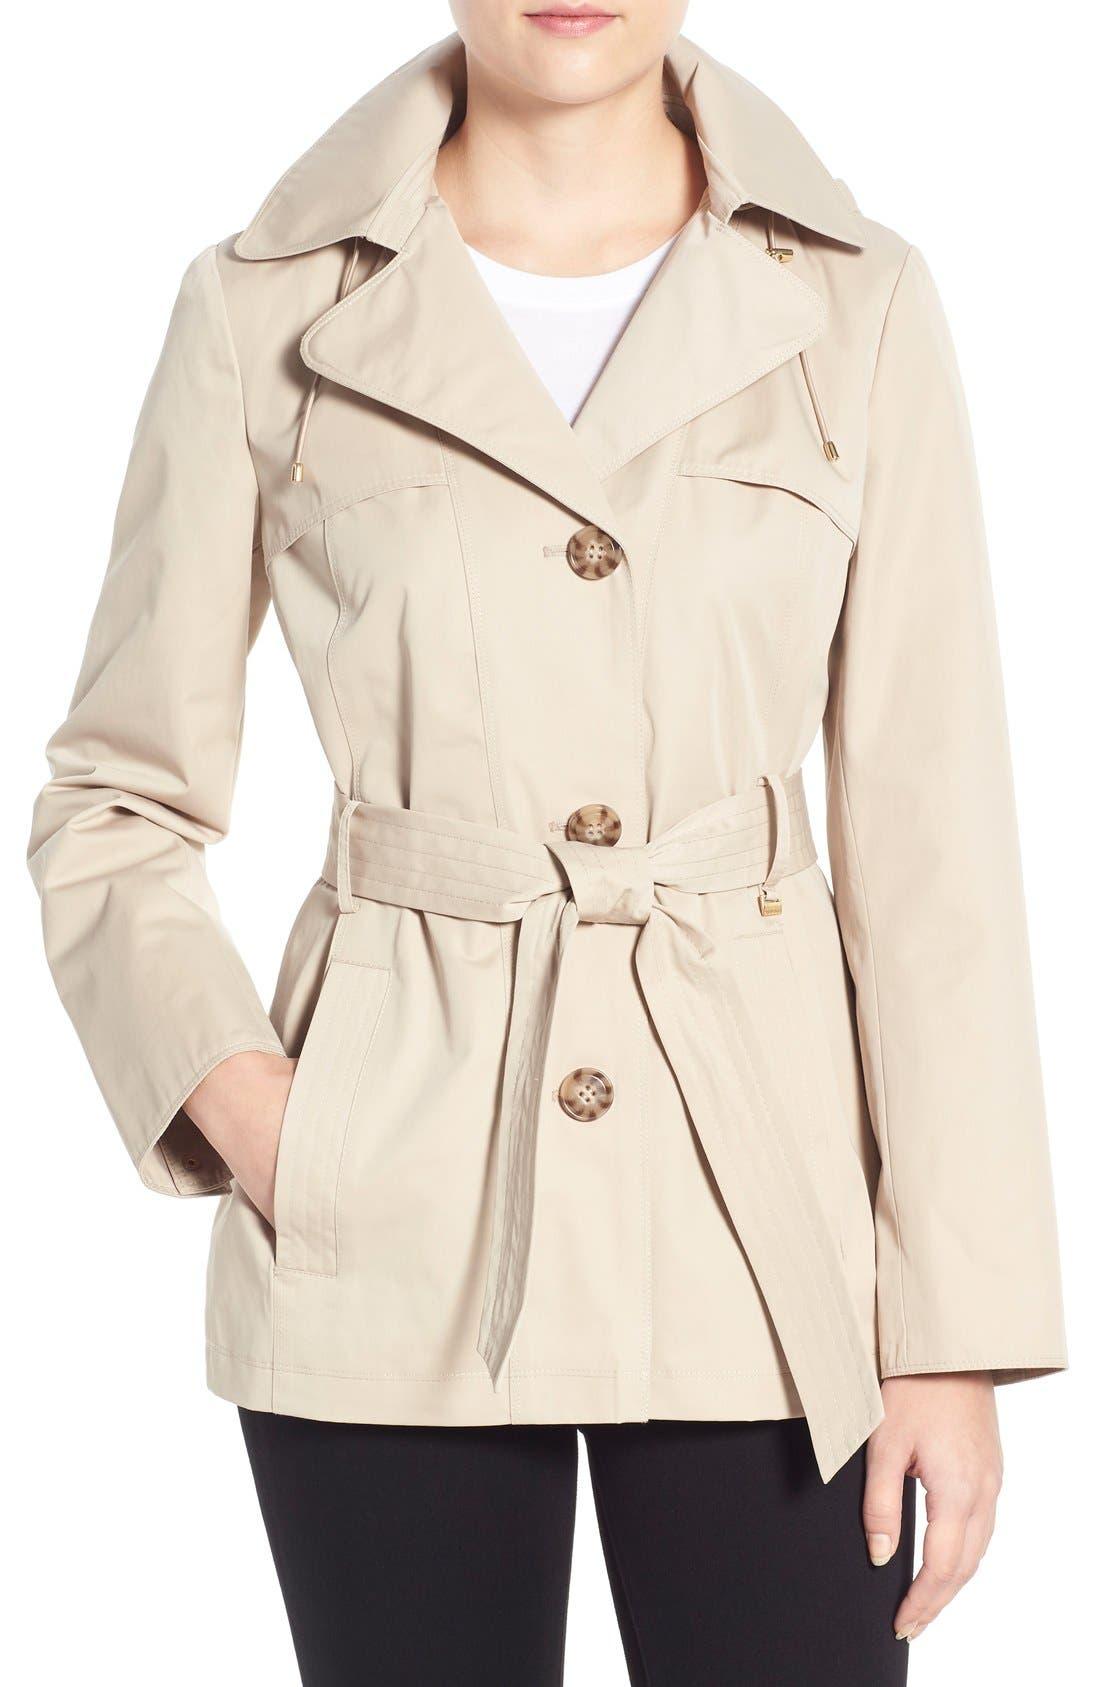 Alternate Image 1 Selected - Ellen Tracy Cotton Blend Short Trench Coat (Regular & Petite)